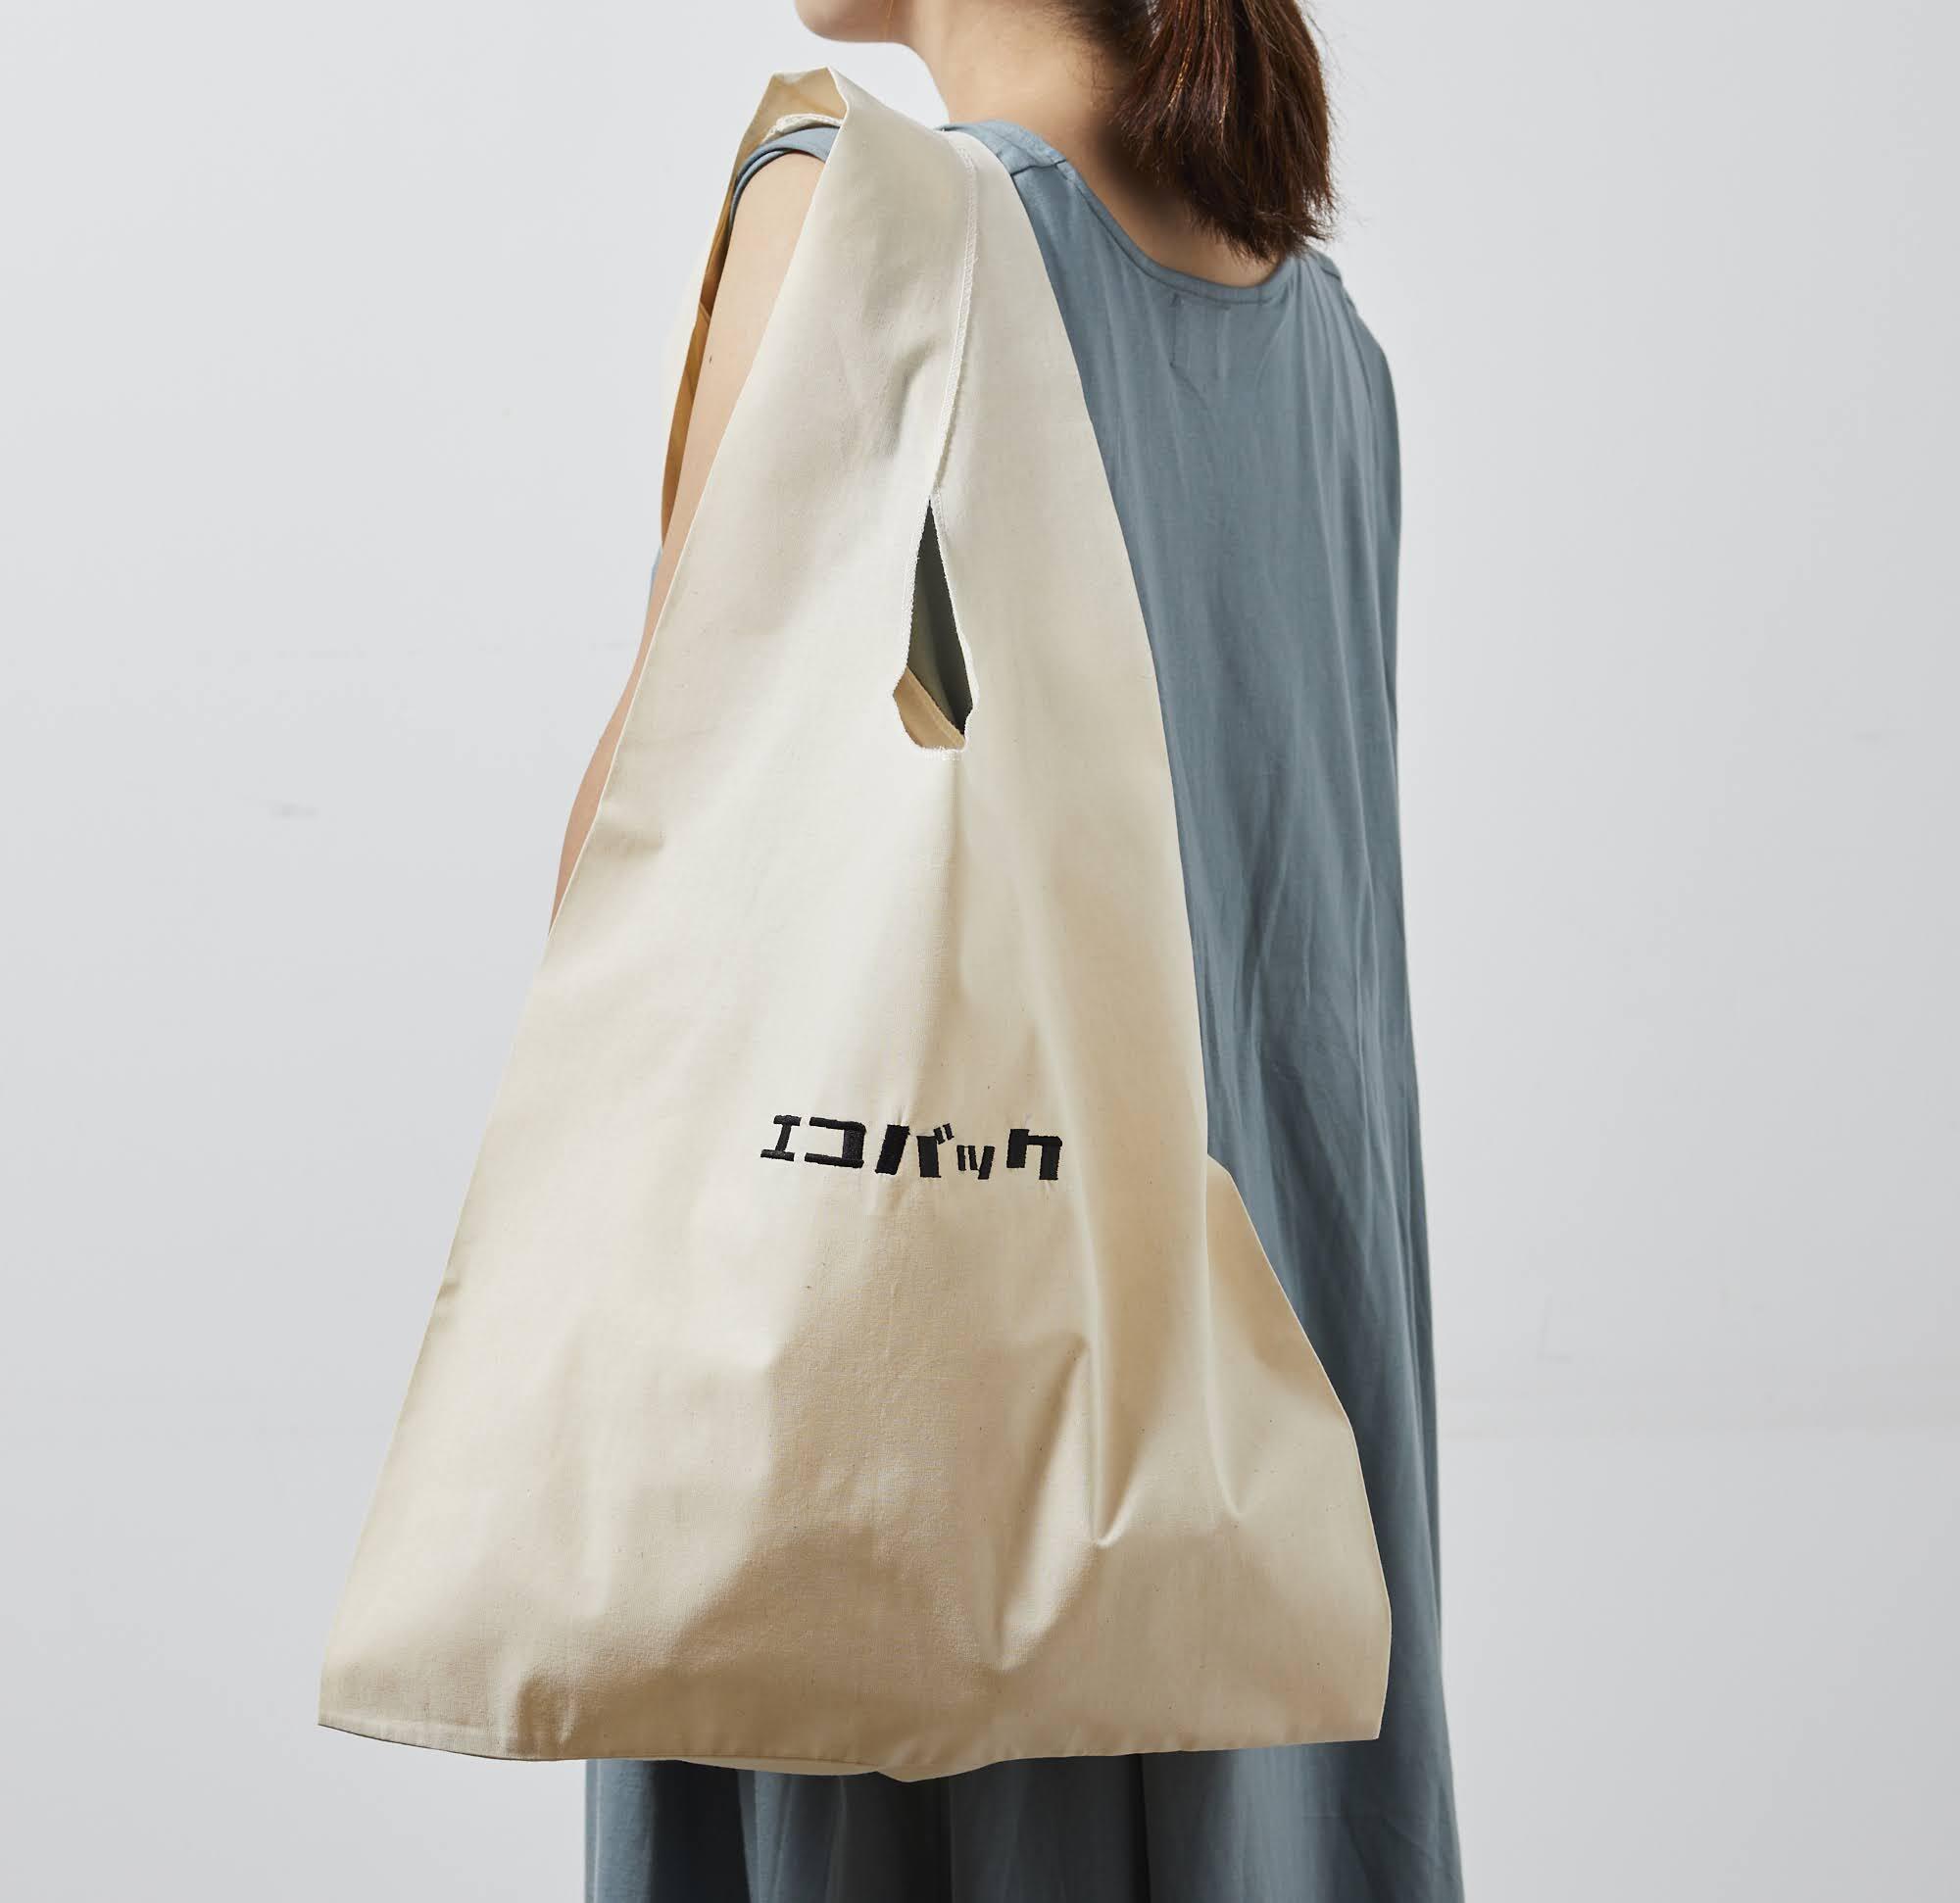 《 Lサイズ 》刺繍のマルシェバック エコバッグ/レジ袋